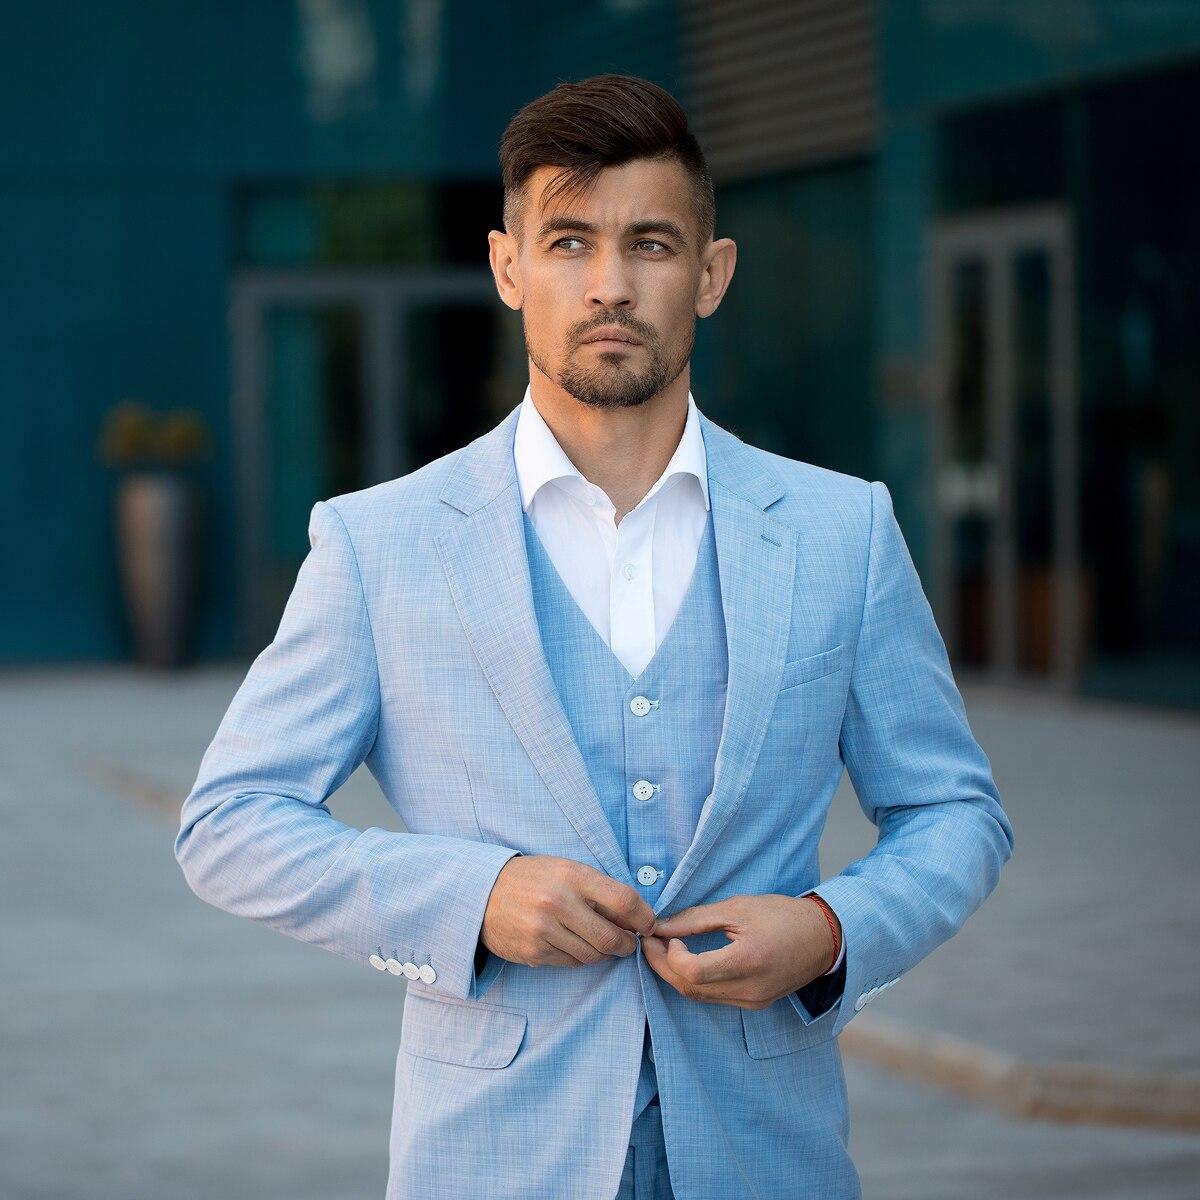 Tian qiong 100% 폴리 에스터 스카이 블루 정장 남자 슬림 맞는 레저 비즈니스 웨딩 드레스 정장 terno masculino tuxedo 3 pcs-에서정장부터 남성 의류 의  그룹 1